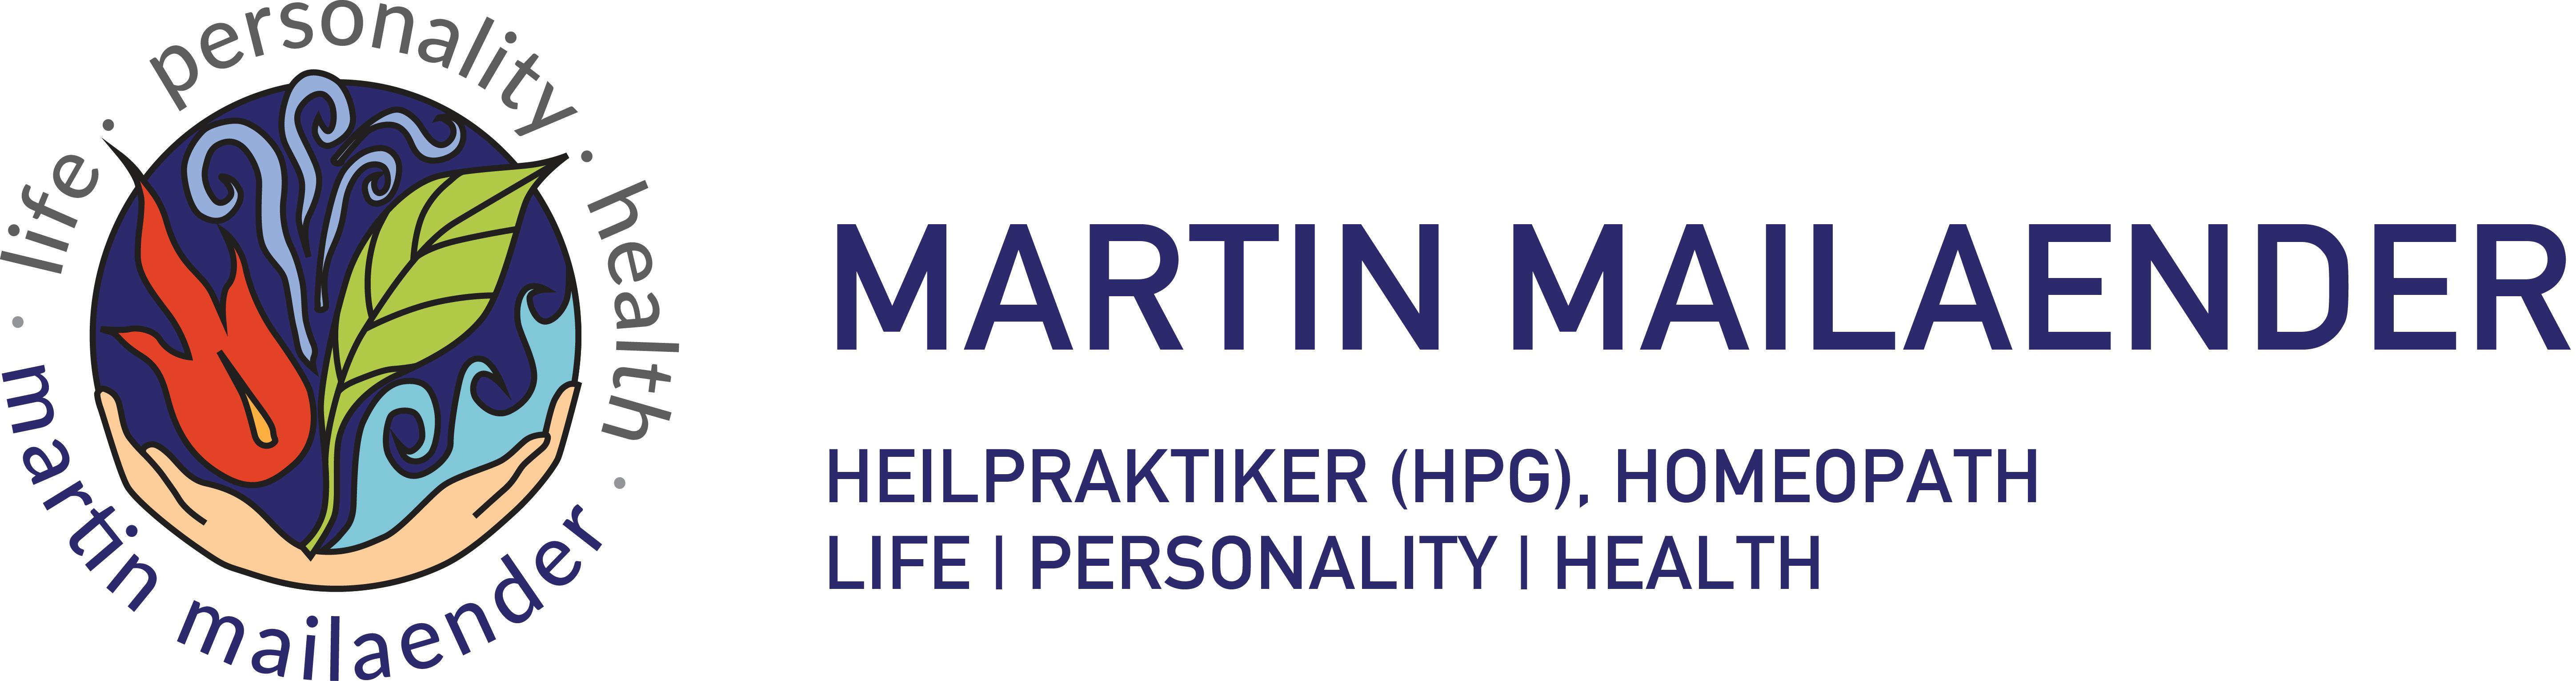 MARTIN MAILAENDER